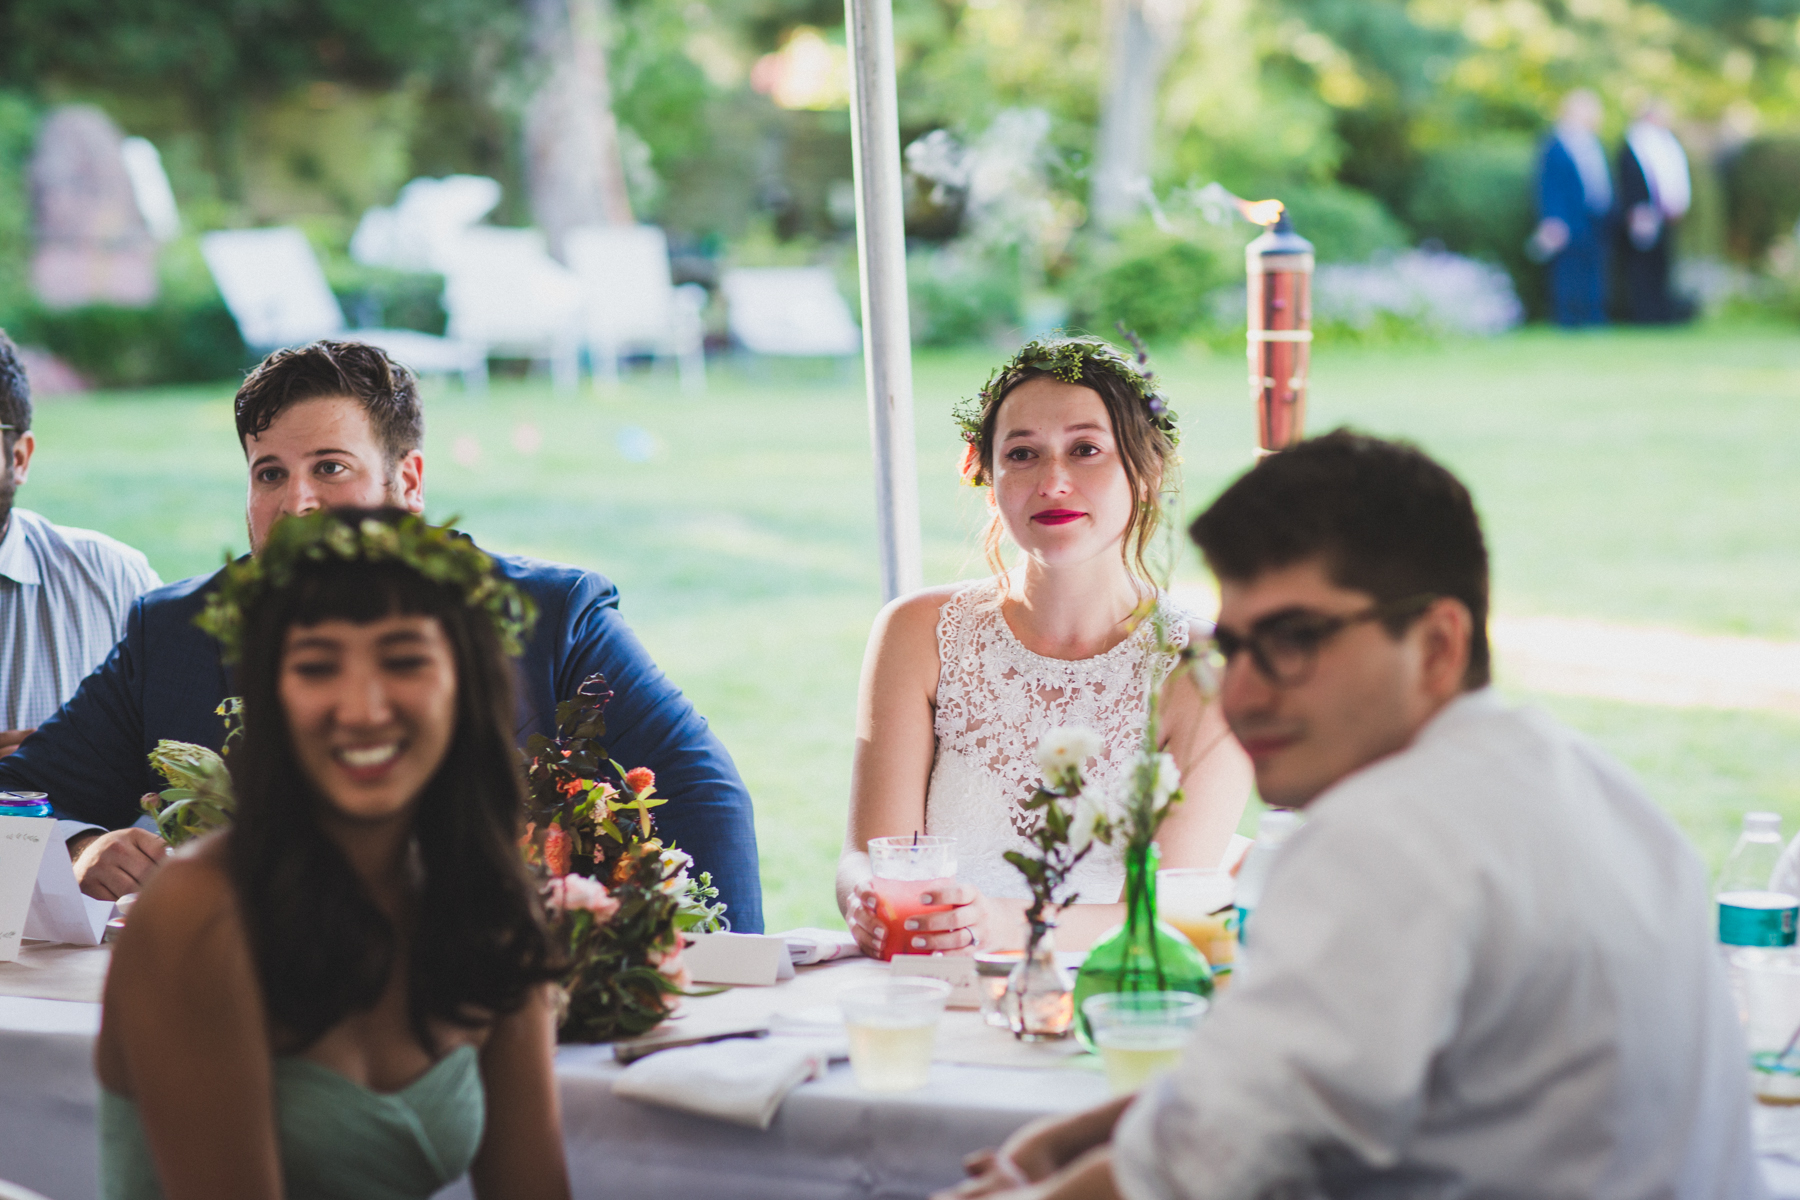 Long-Island-Documentary-Wedding-Photography-Summer-Tent-Wedding-in-New-York-119.jpg